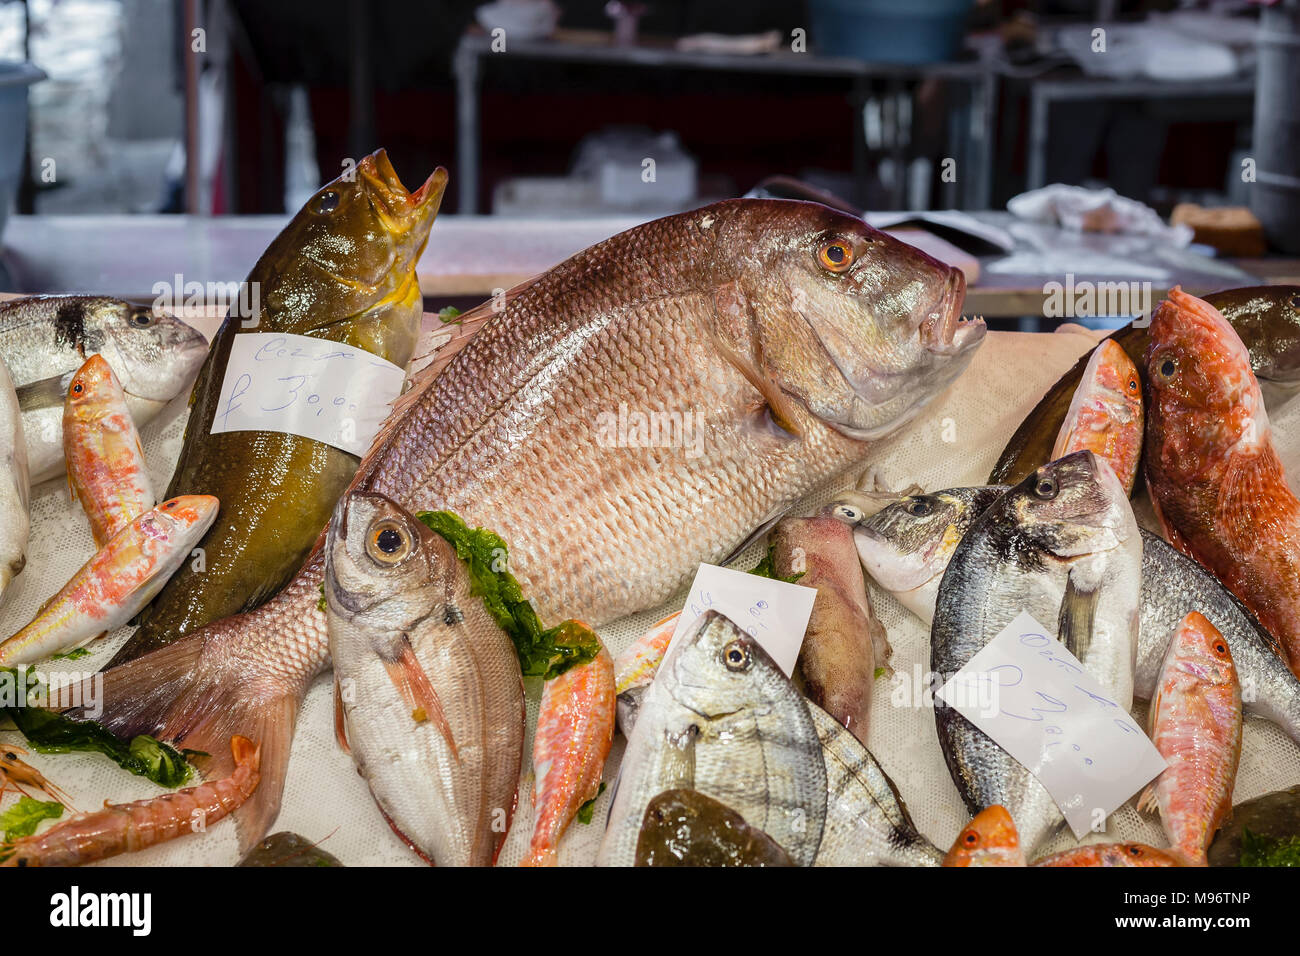 La Pescheria fish market, Catania, Sicily, Italy. - Stock Image